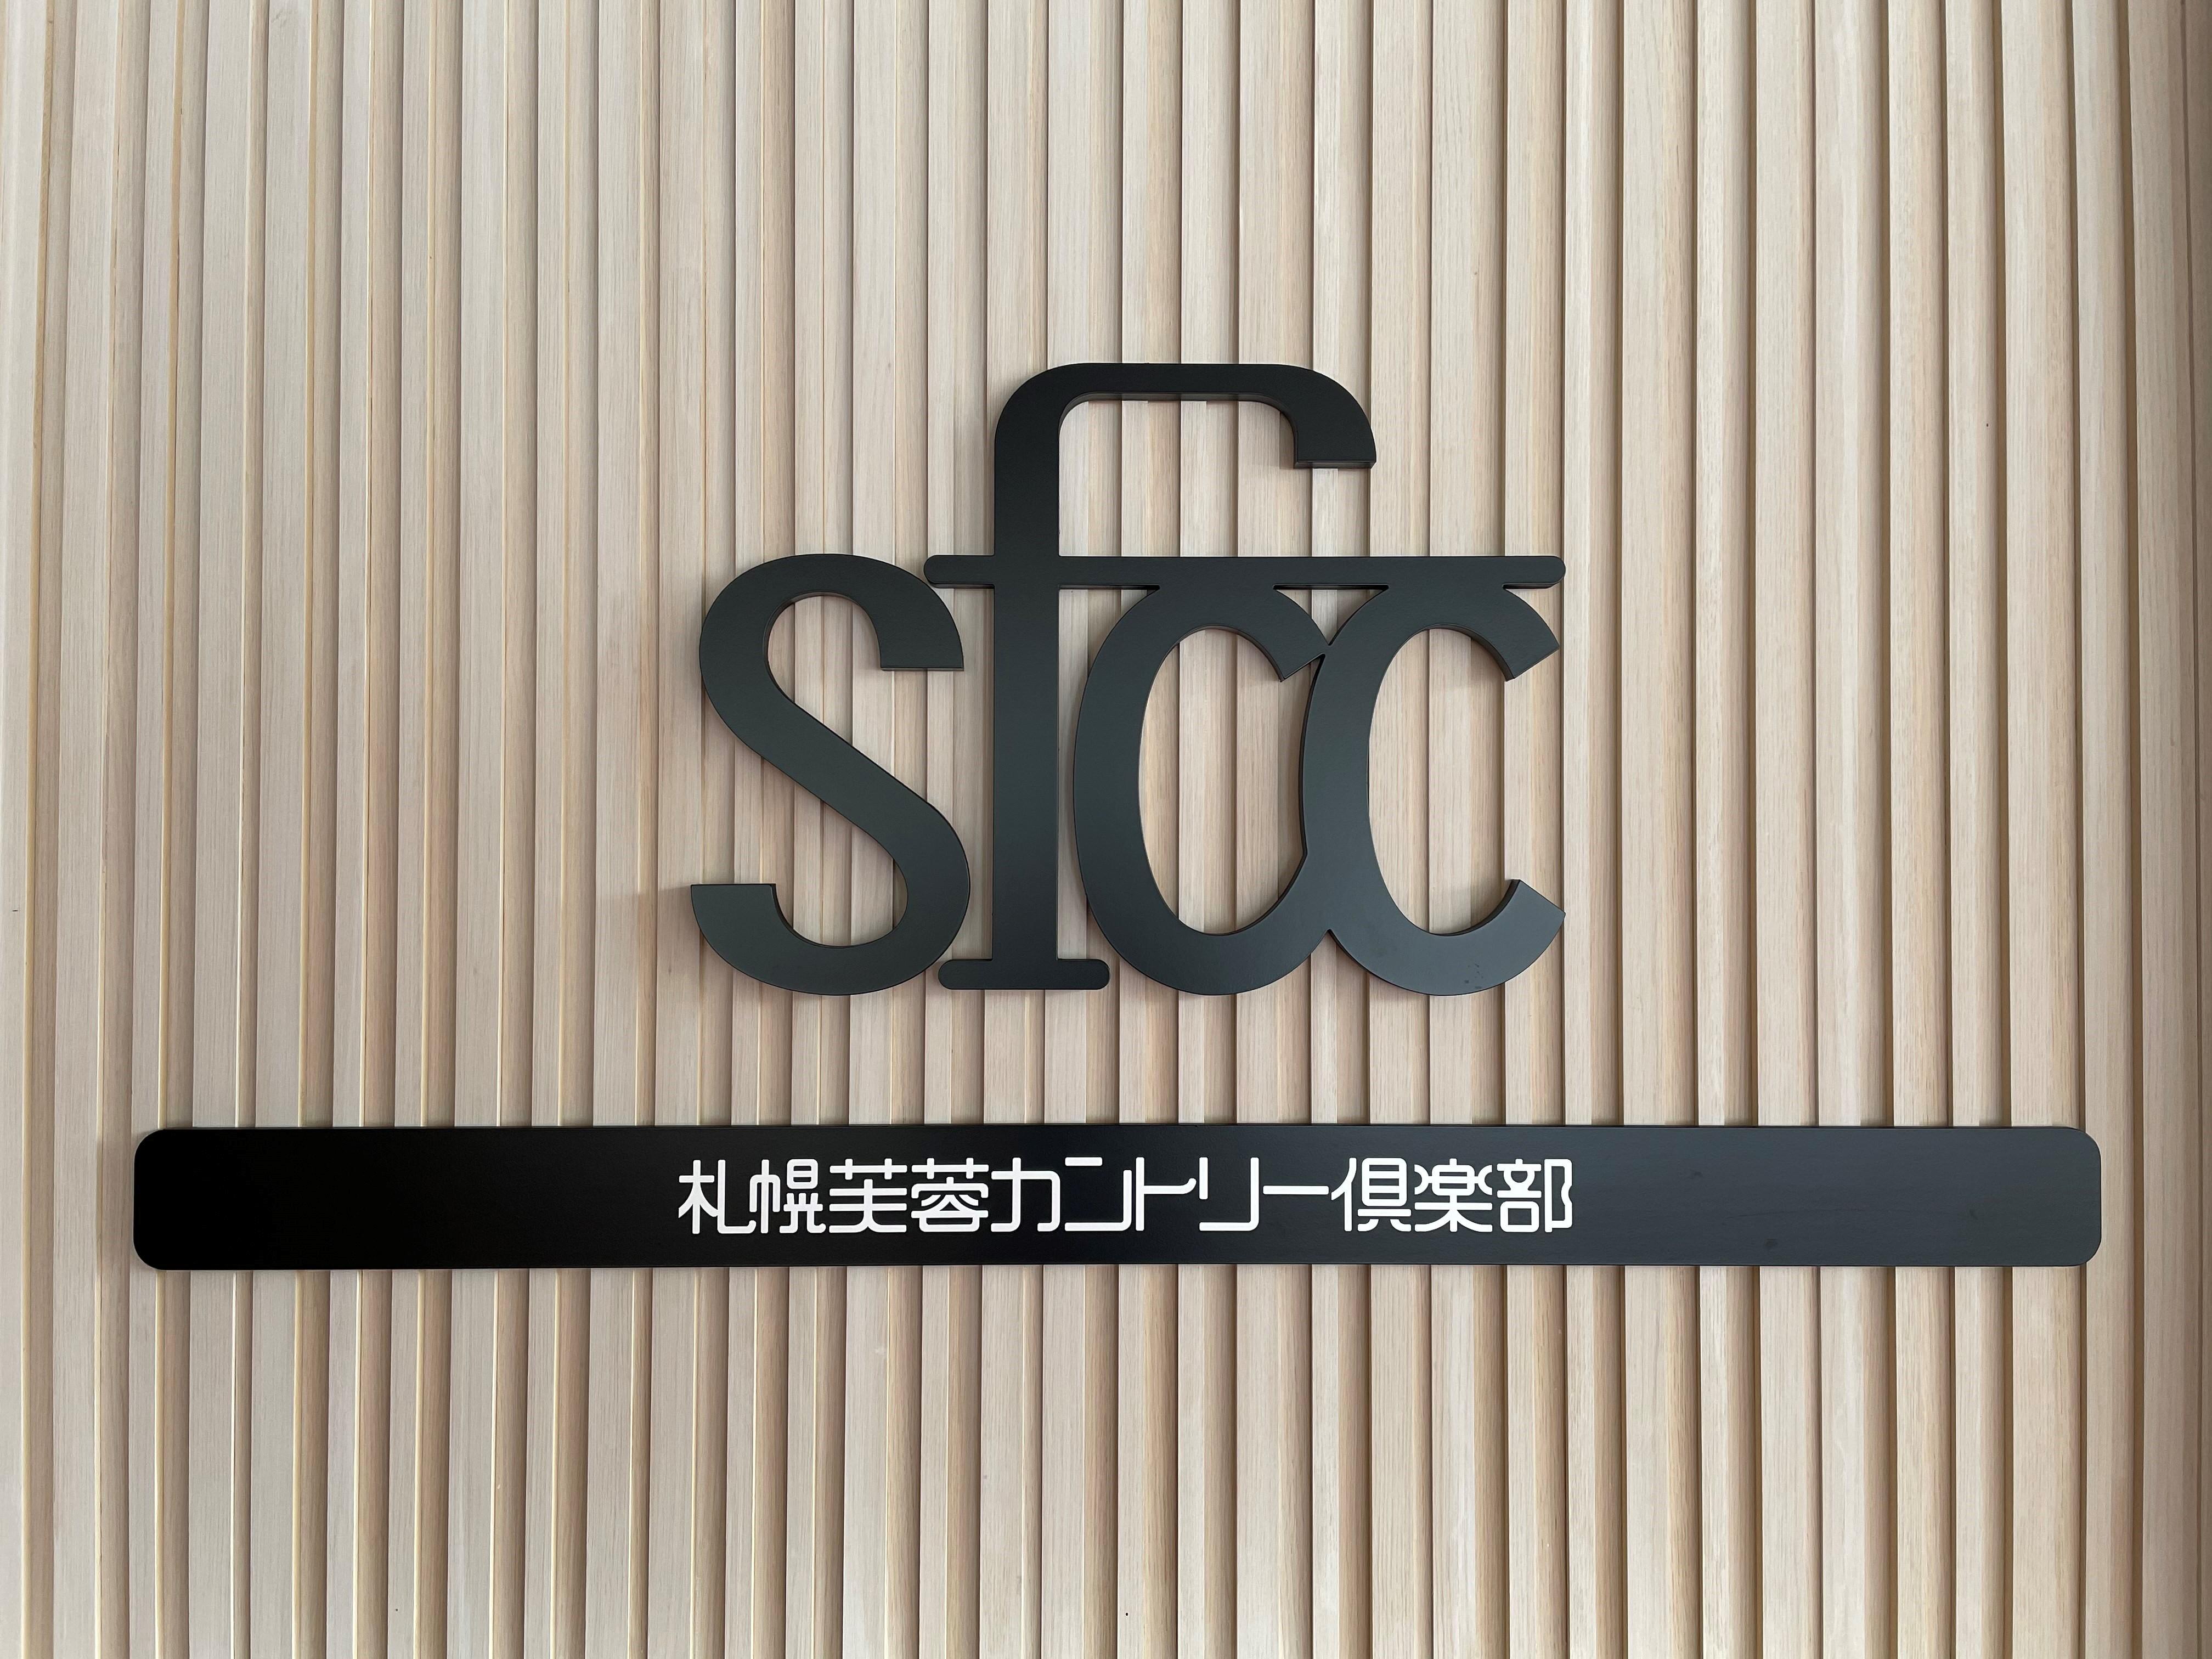 【北海道】札幌芙蓉カントリー倶楽部